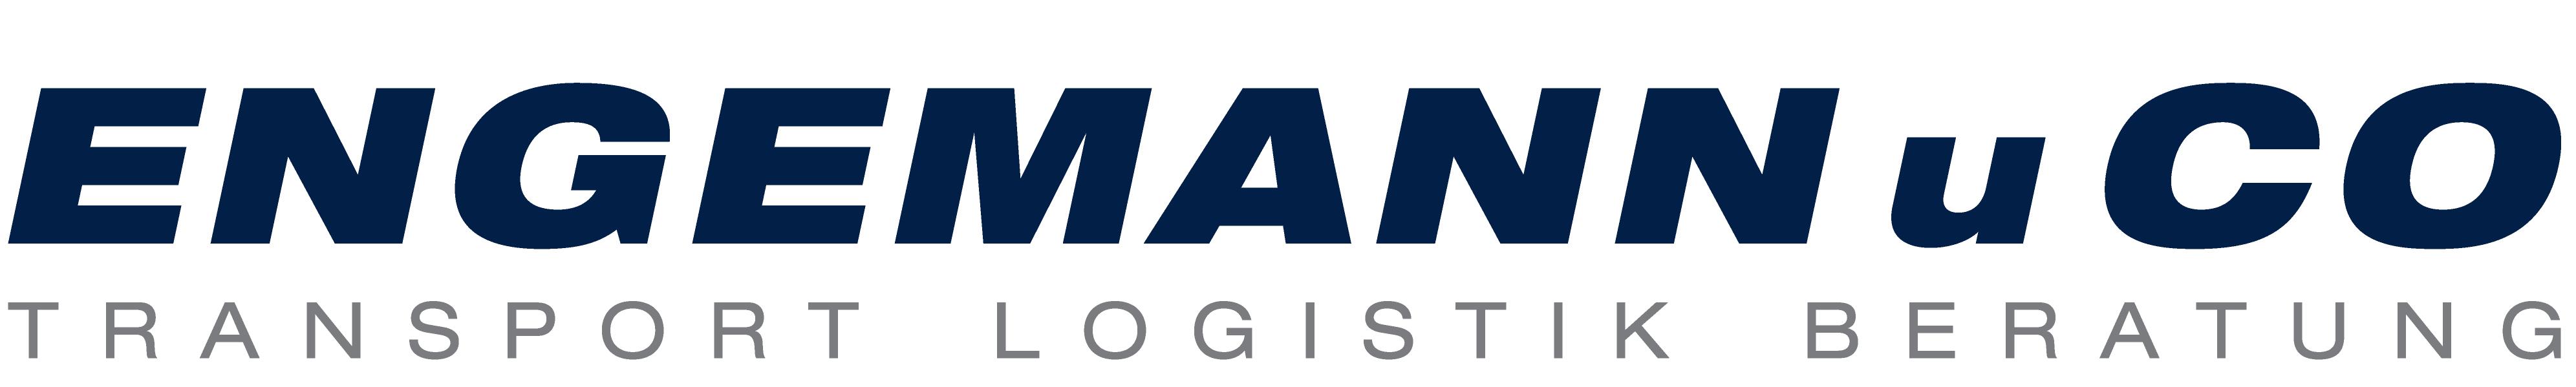 ENGEMANN u. CO. Internationale Spedition GmbH Logo